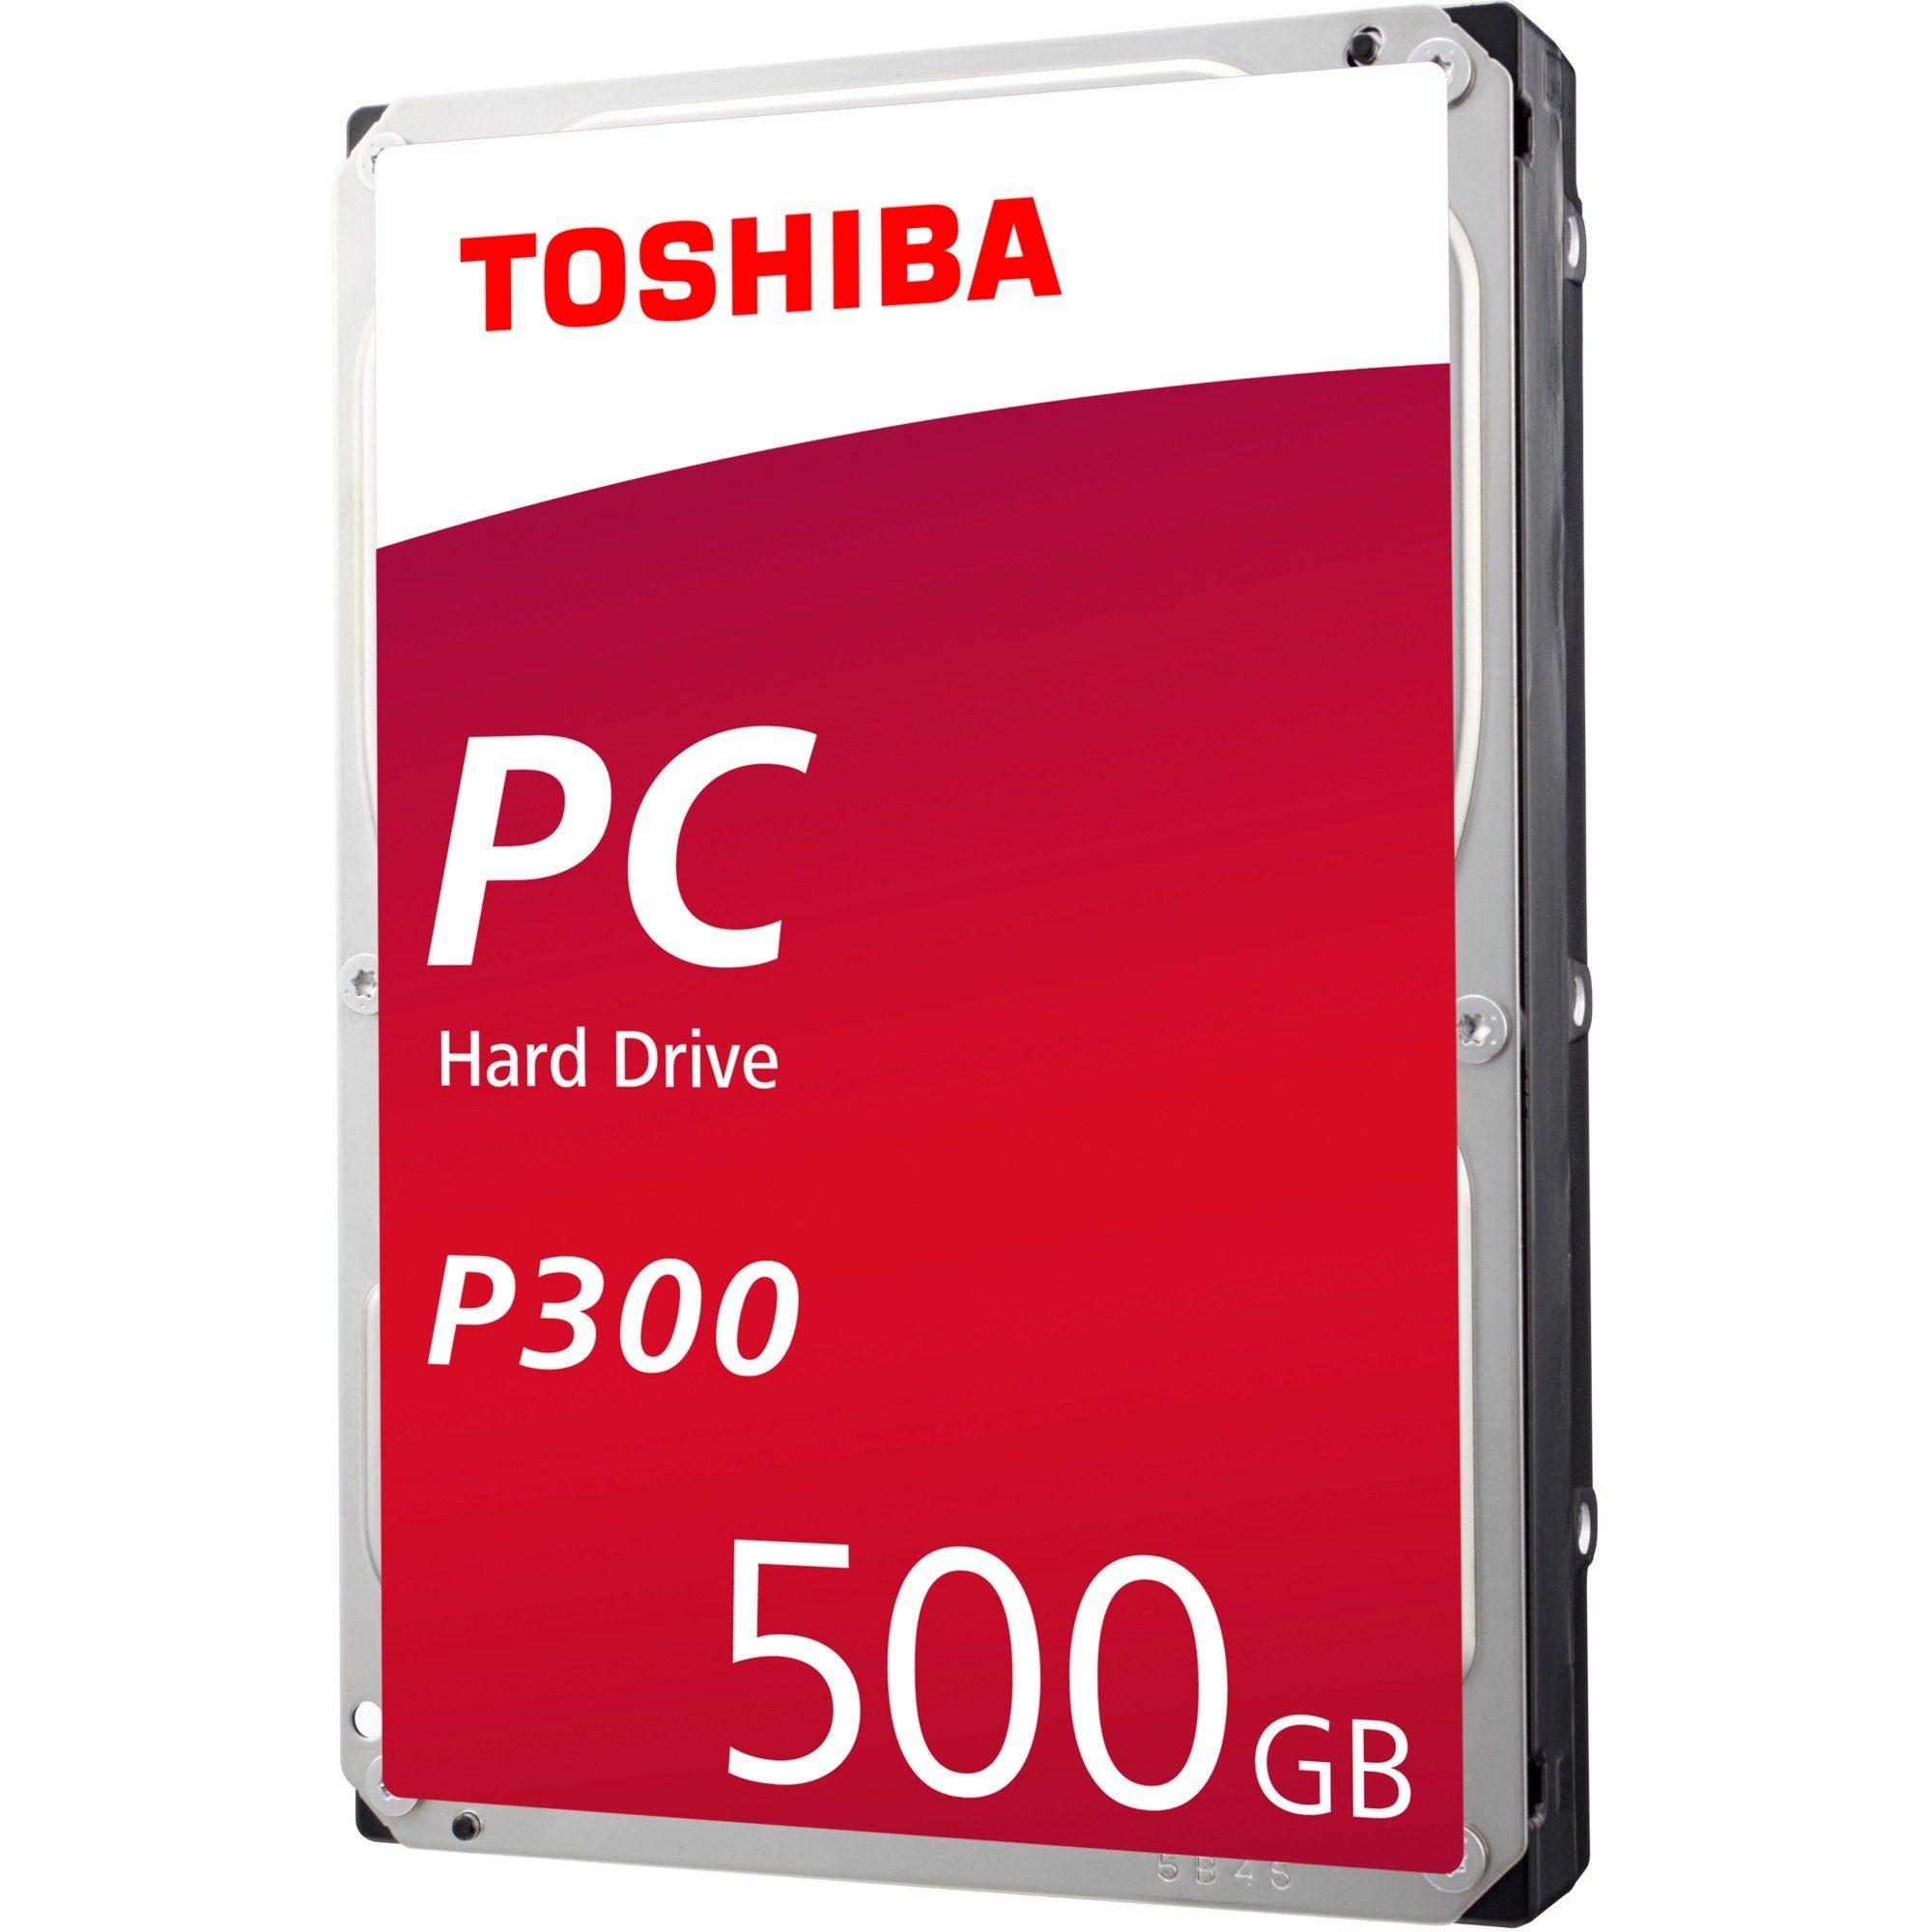 "Toshiba Festplatte »HDWD105UZSVA 500 GB, SATA 6 Gb/s, 3,5"", P300«"